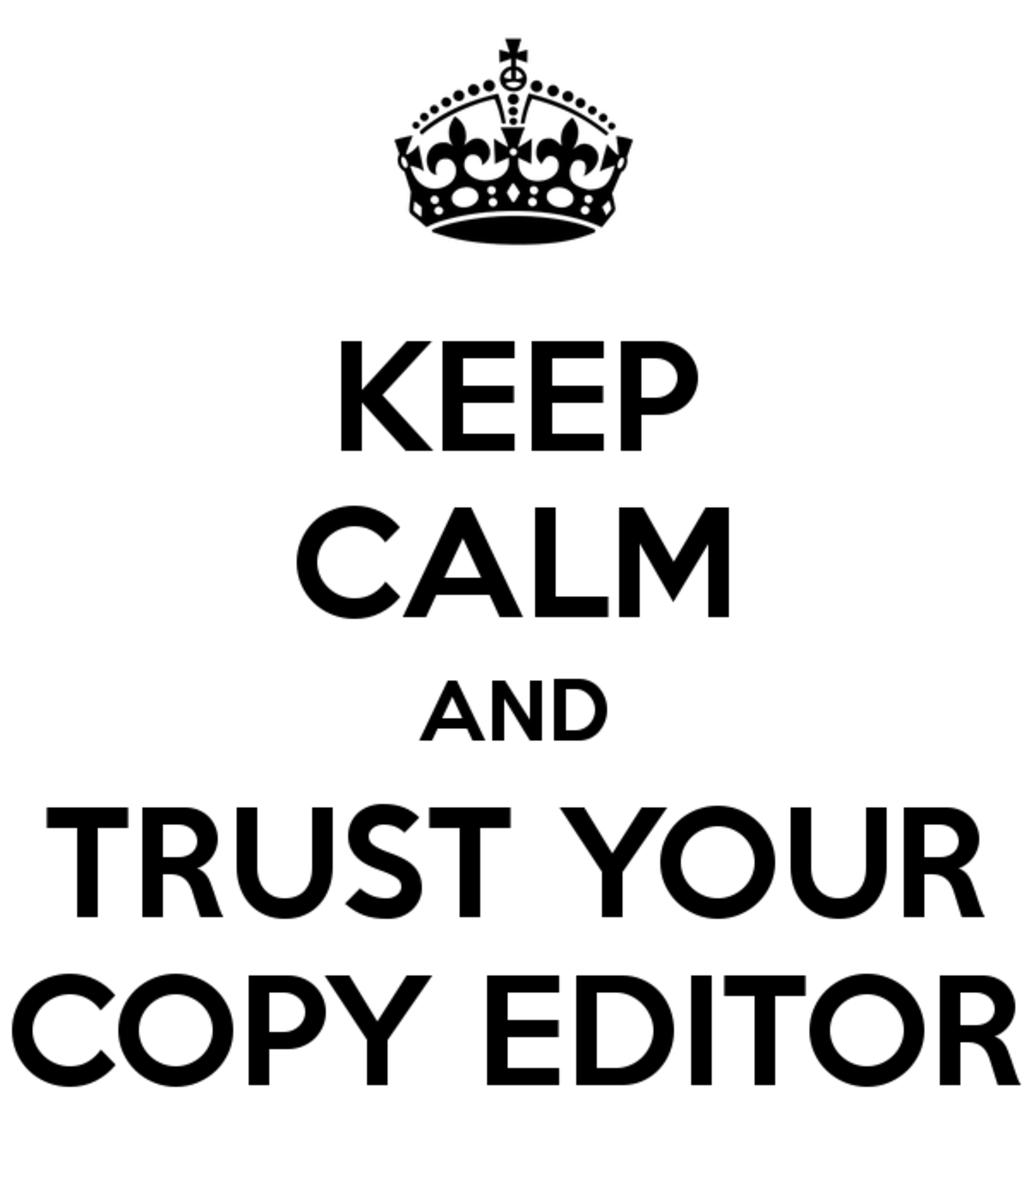 Copy editors will help you make your manuscript glow.